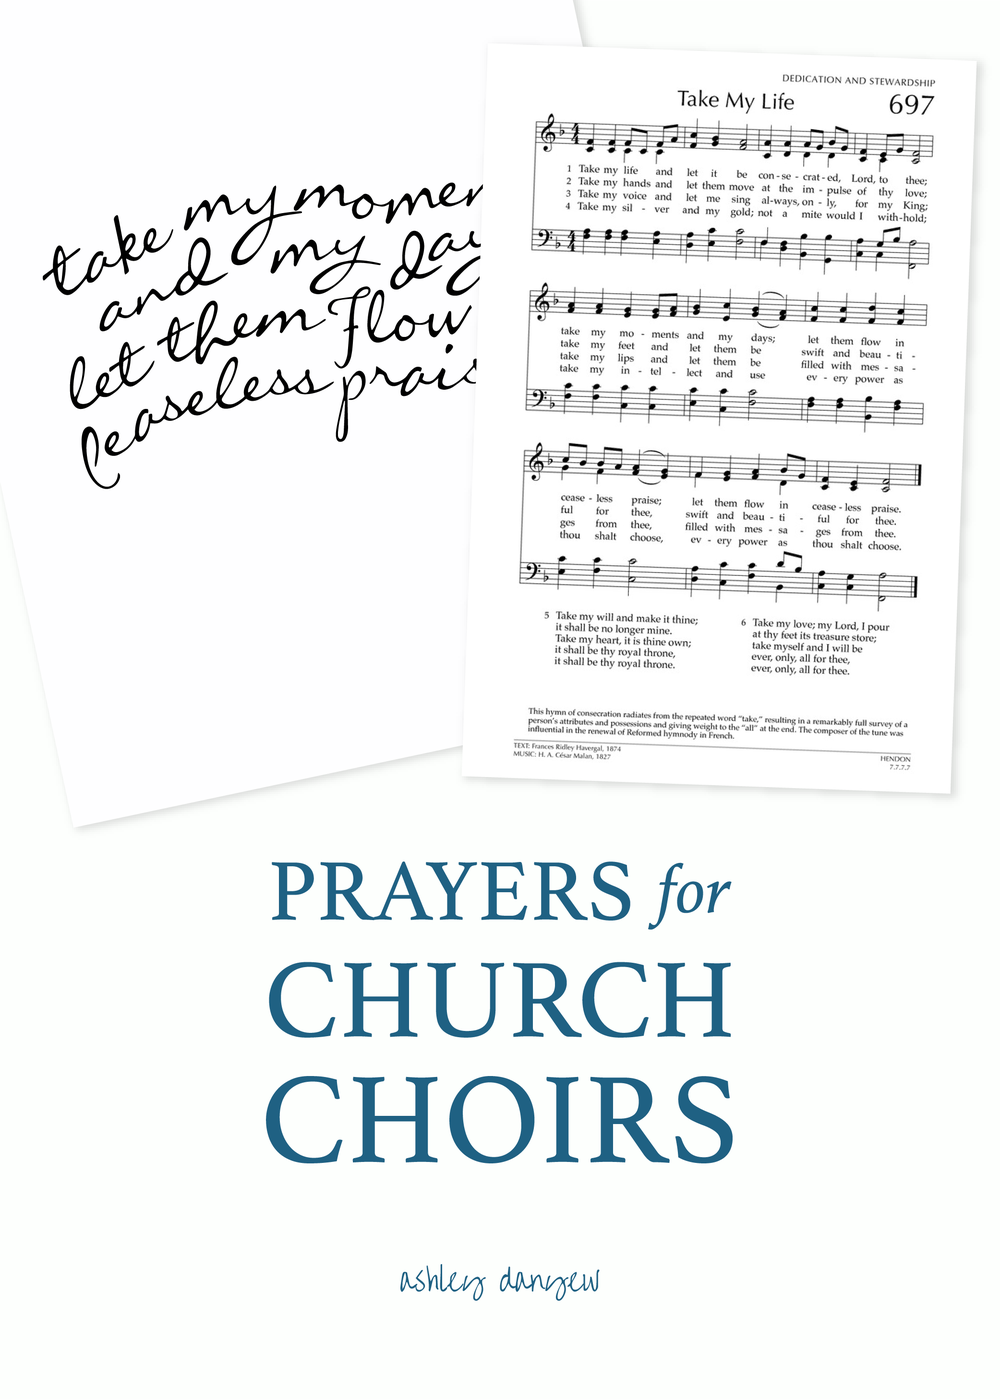 Prayers for Church Choirs-01.png